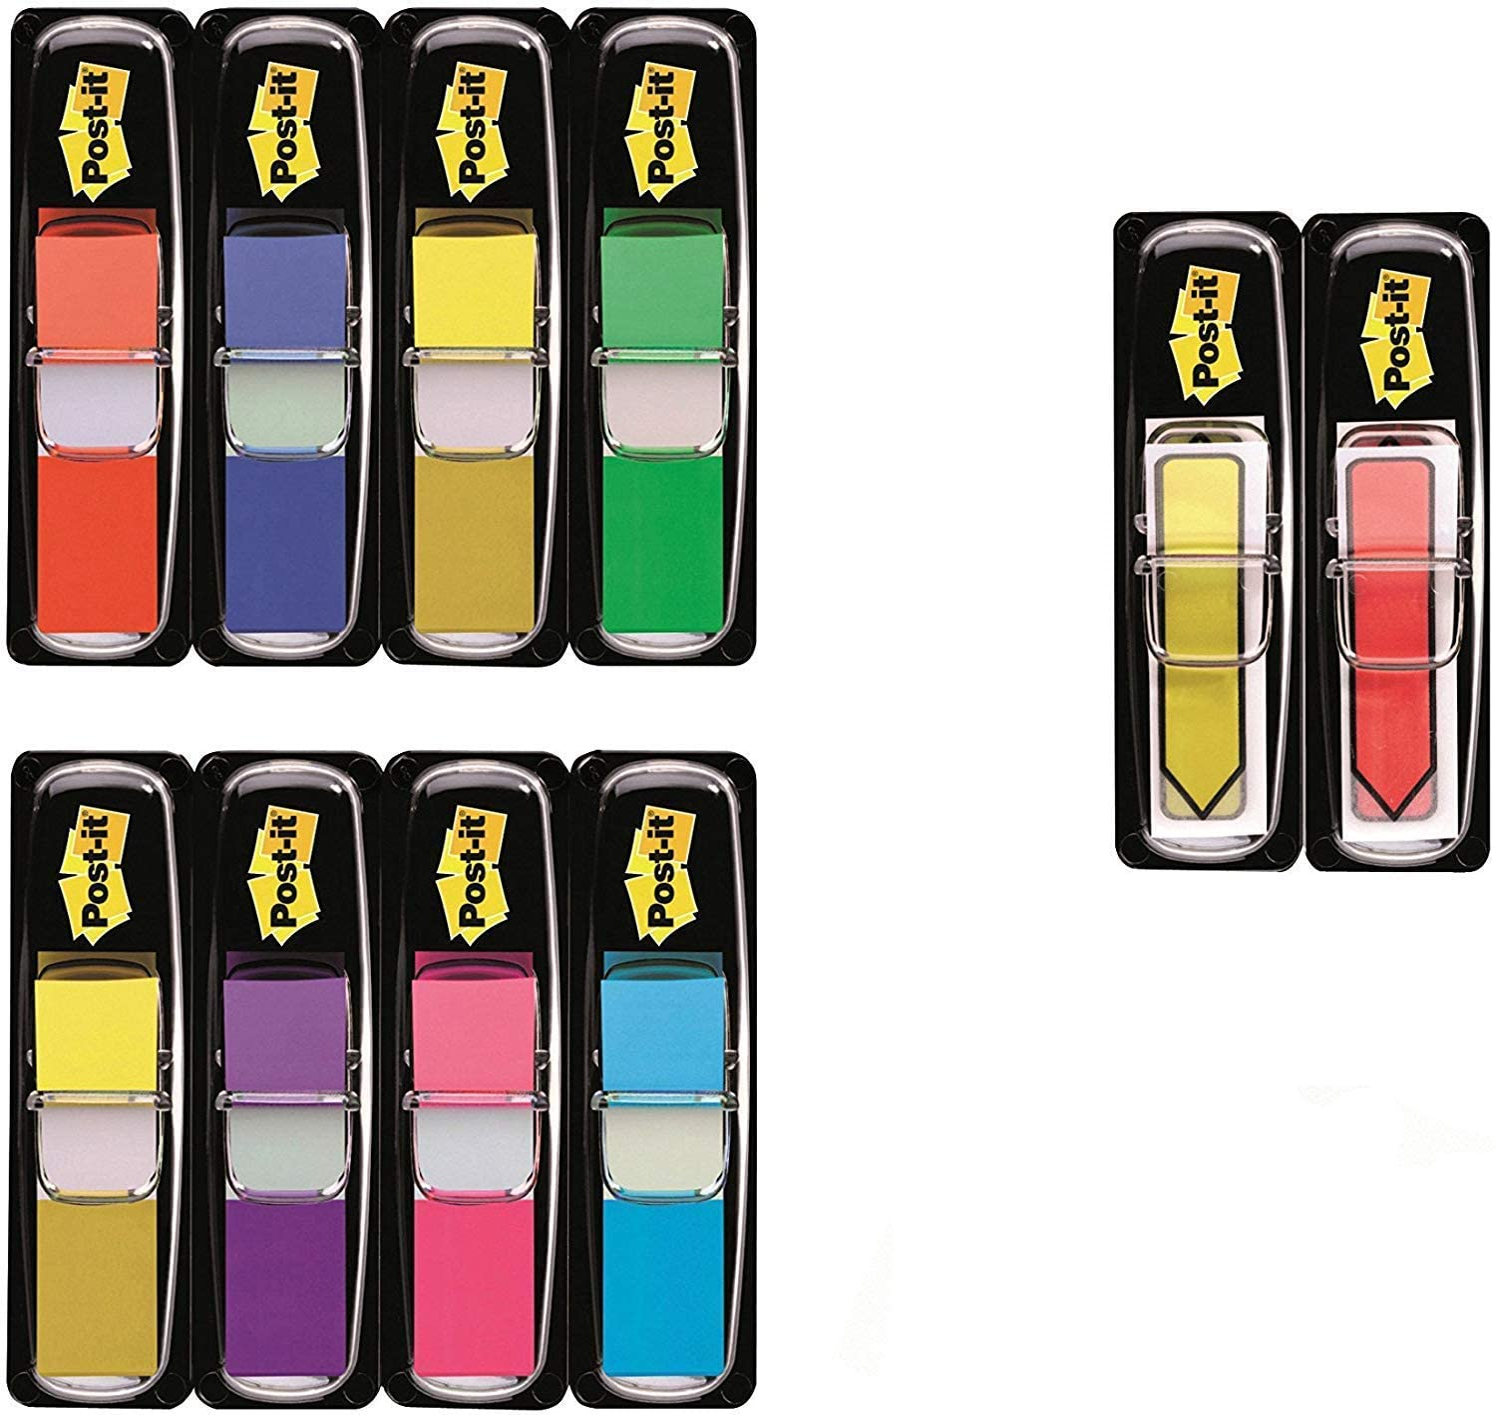 3M Post-It Index Mini Promotion - 8 x 35 Marcadores adhesivos, 2 x 24 Post-it Index flechas adhesivas 43.2 x 12 mm – colores surtidos